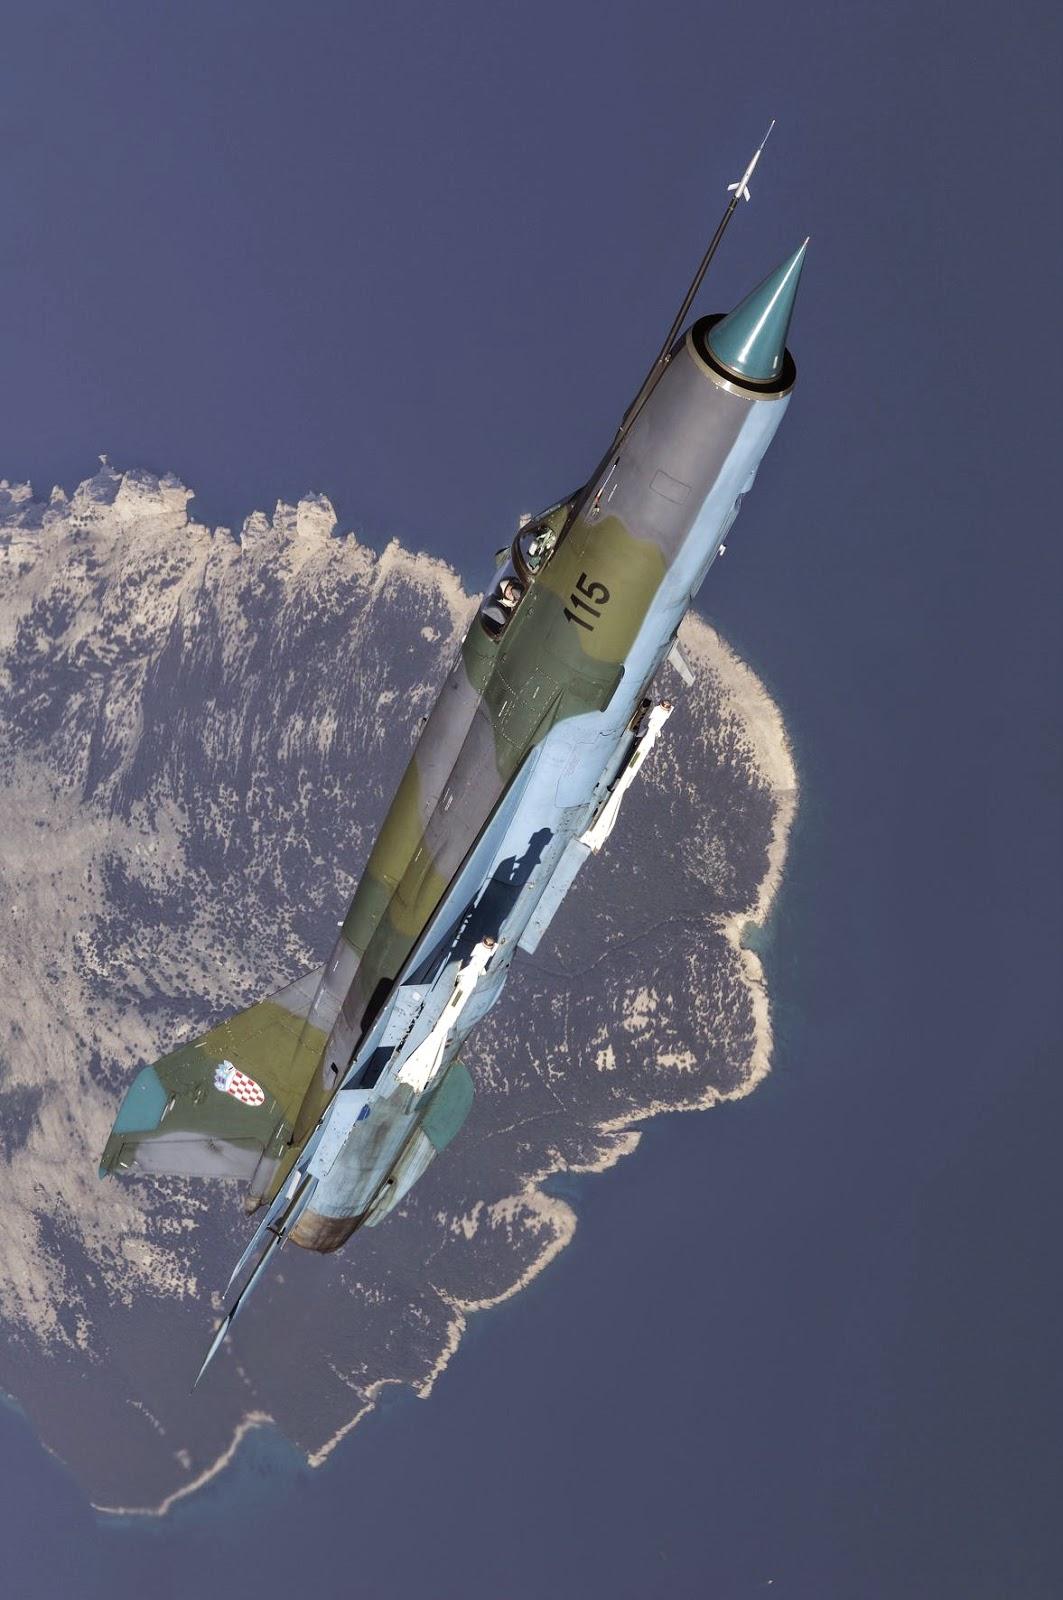 Croatian MIG-21